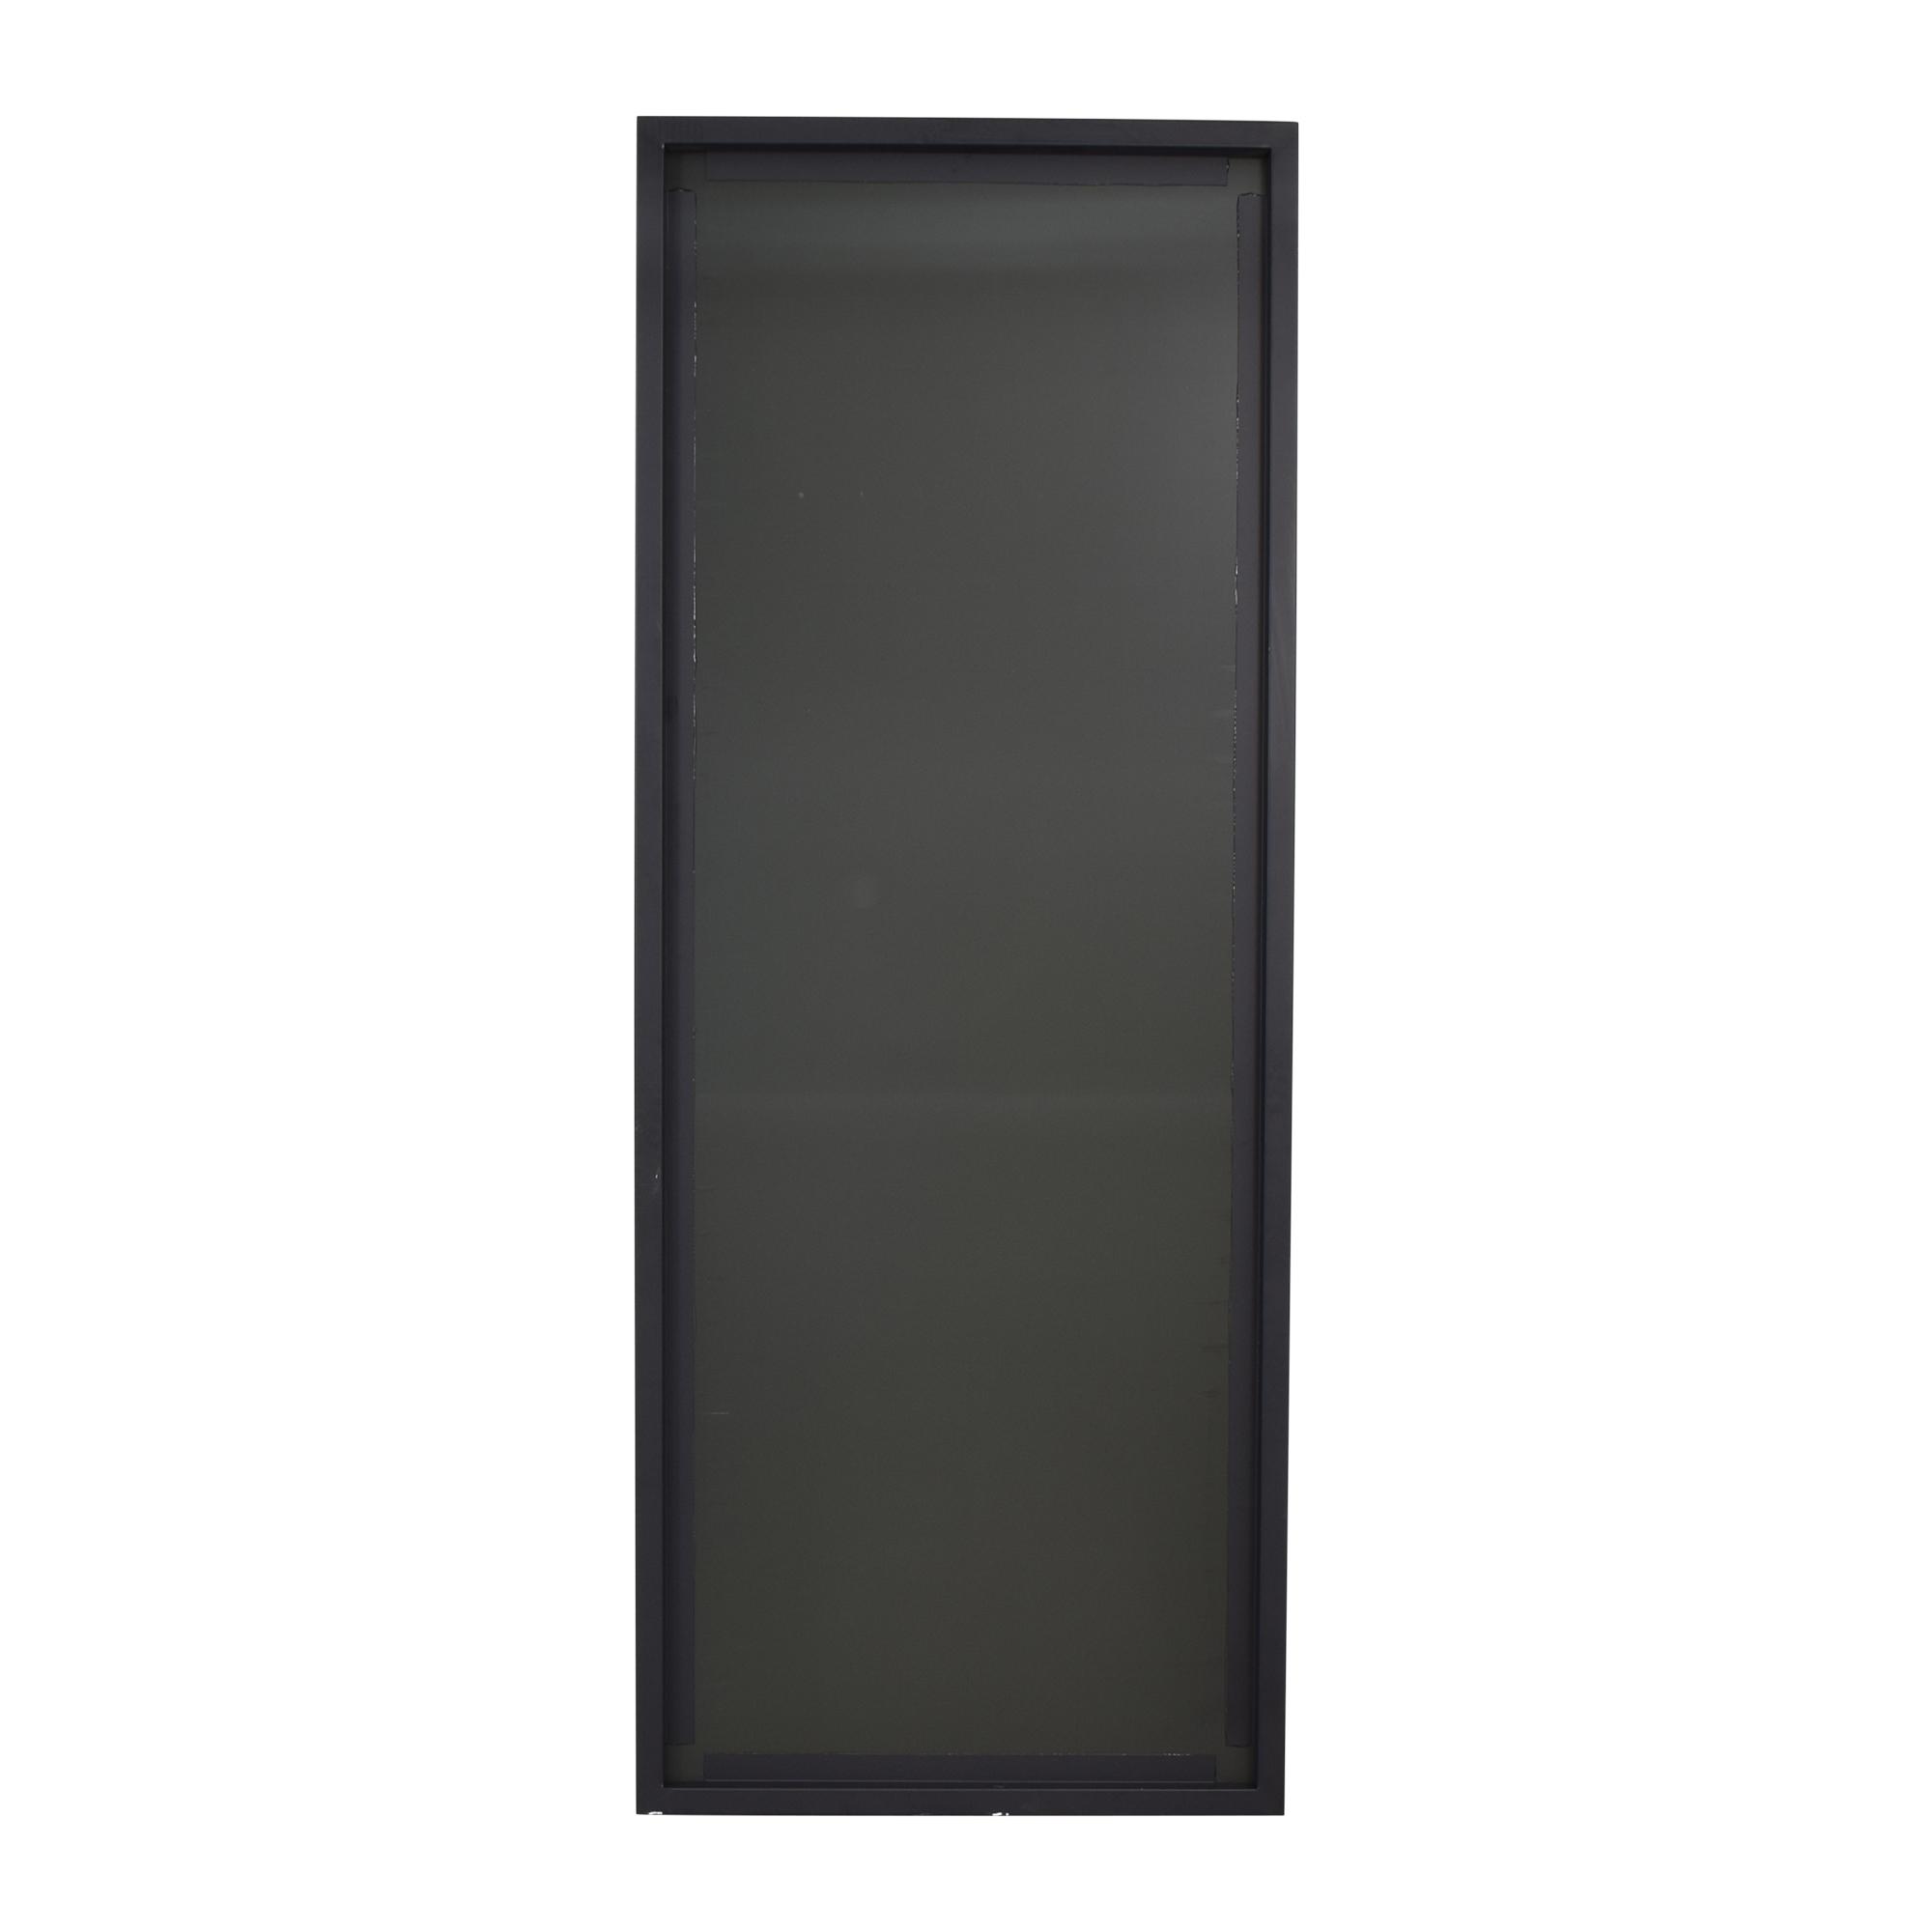 shop Room & Board Room & Board Infinity Mirror online